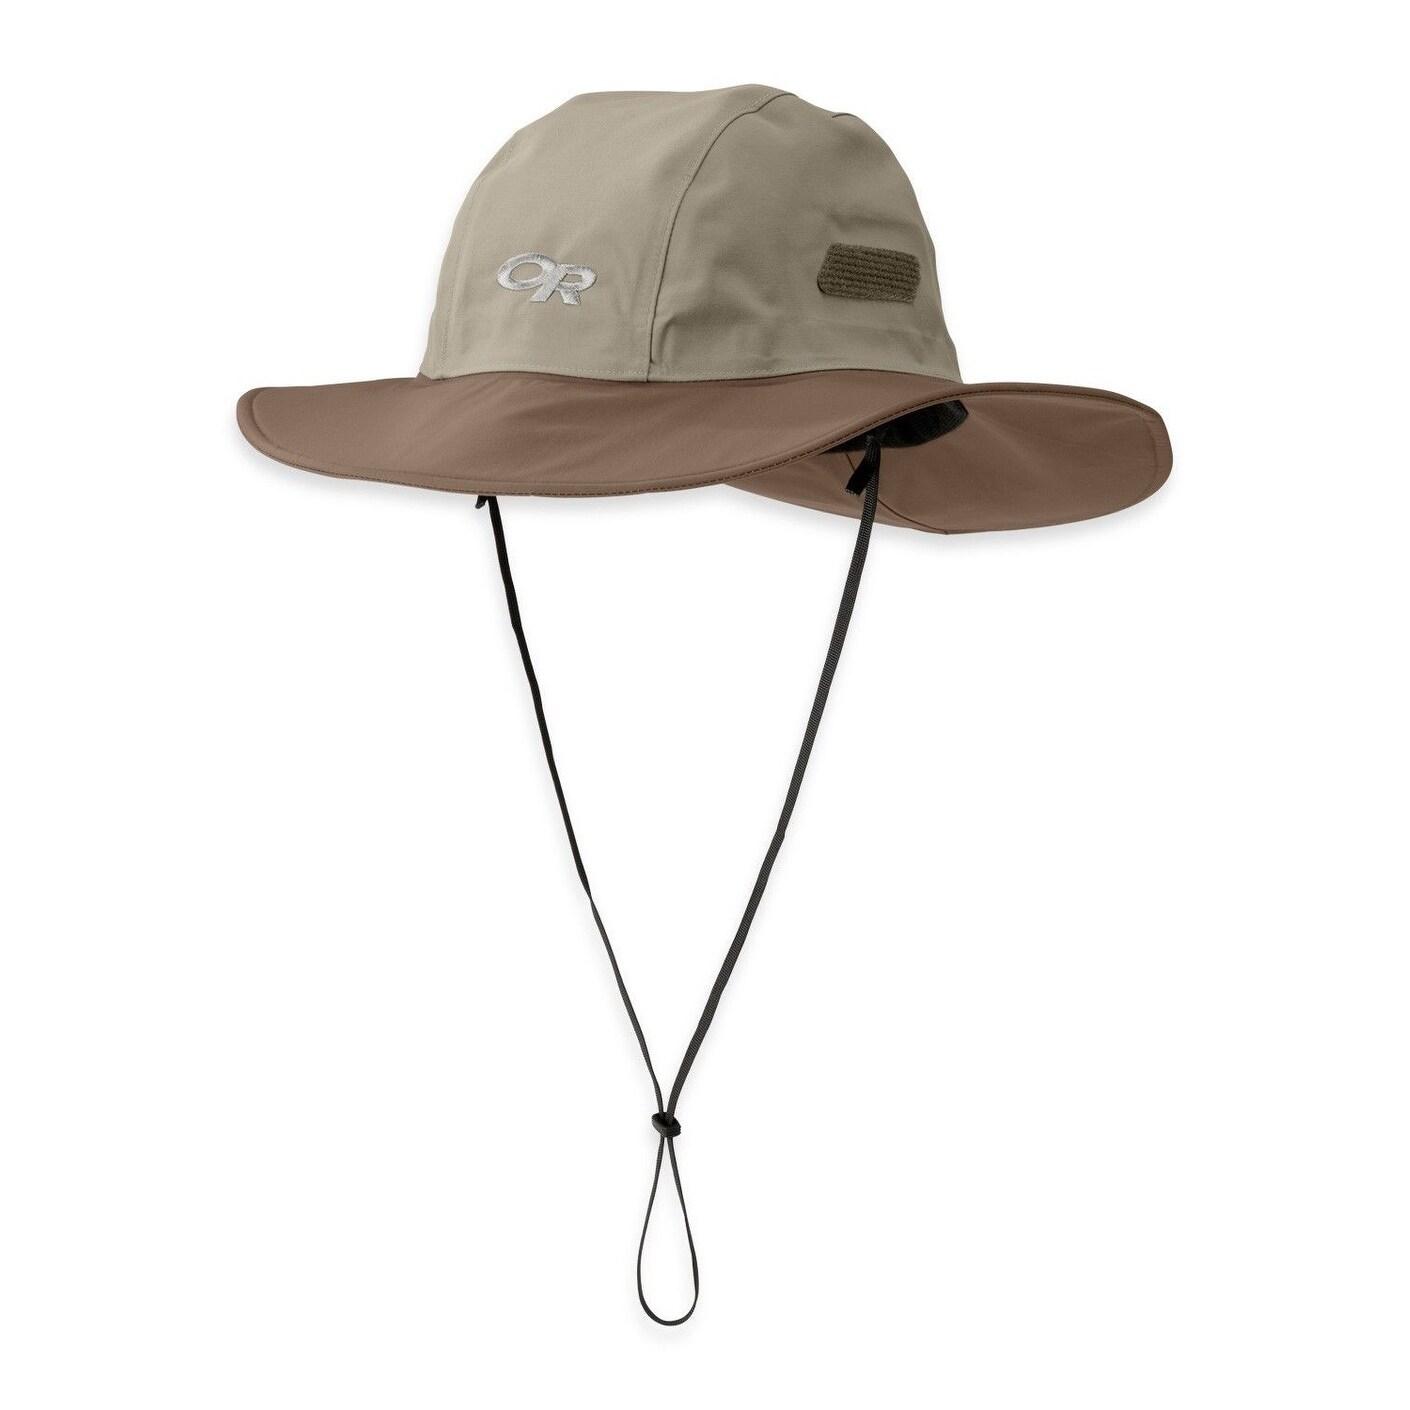 Shop Outdoor Research Seattle Sombrero Goretex Rain Hat - Free ... 682dbc8b12f